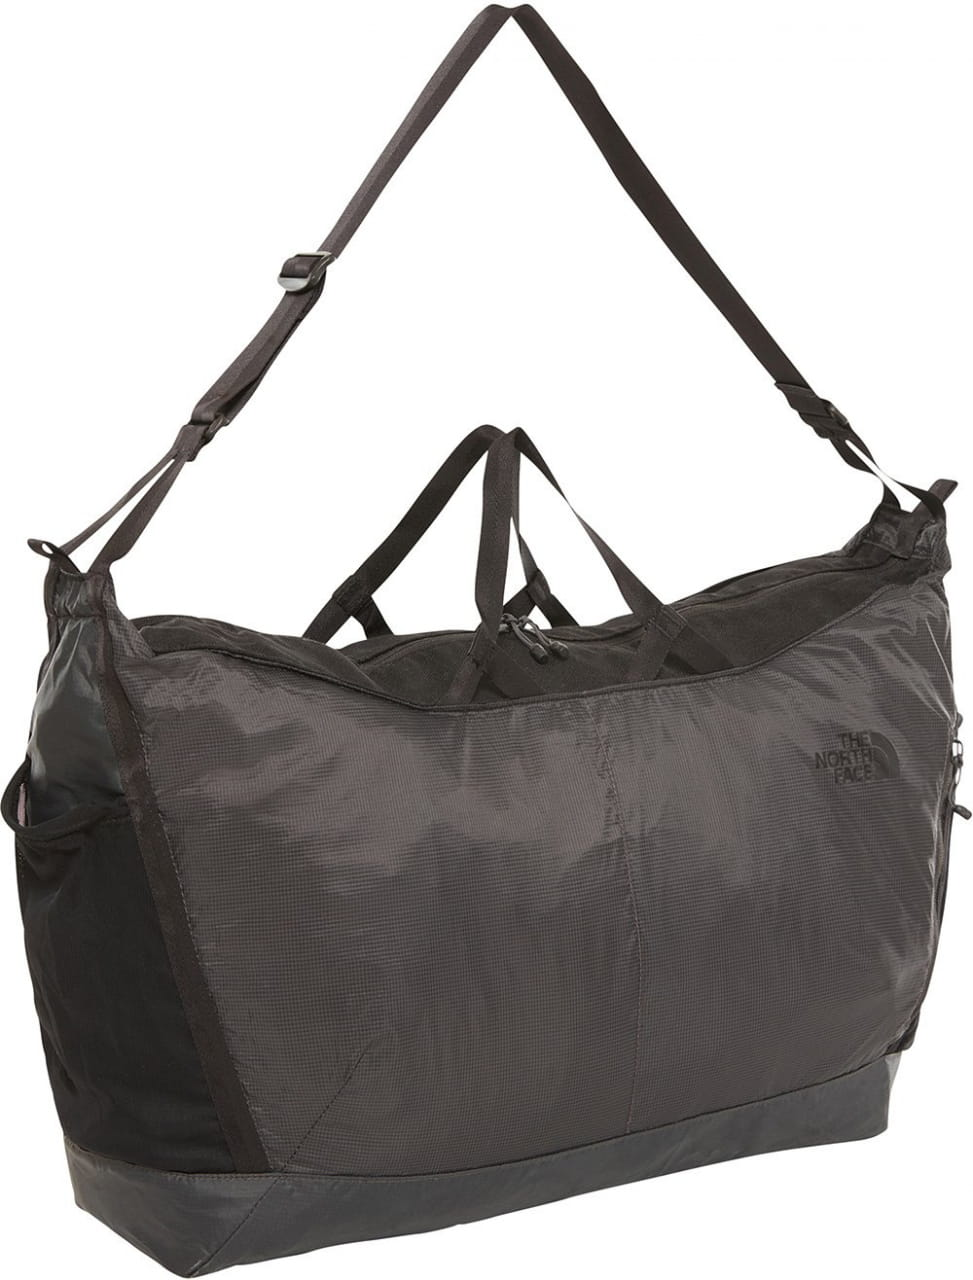 Taschen und Rucksäcke The North Face Flyweight Duffel Bag